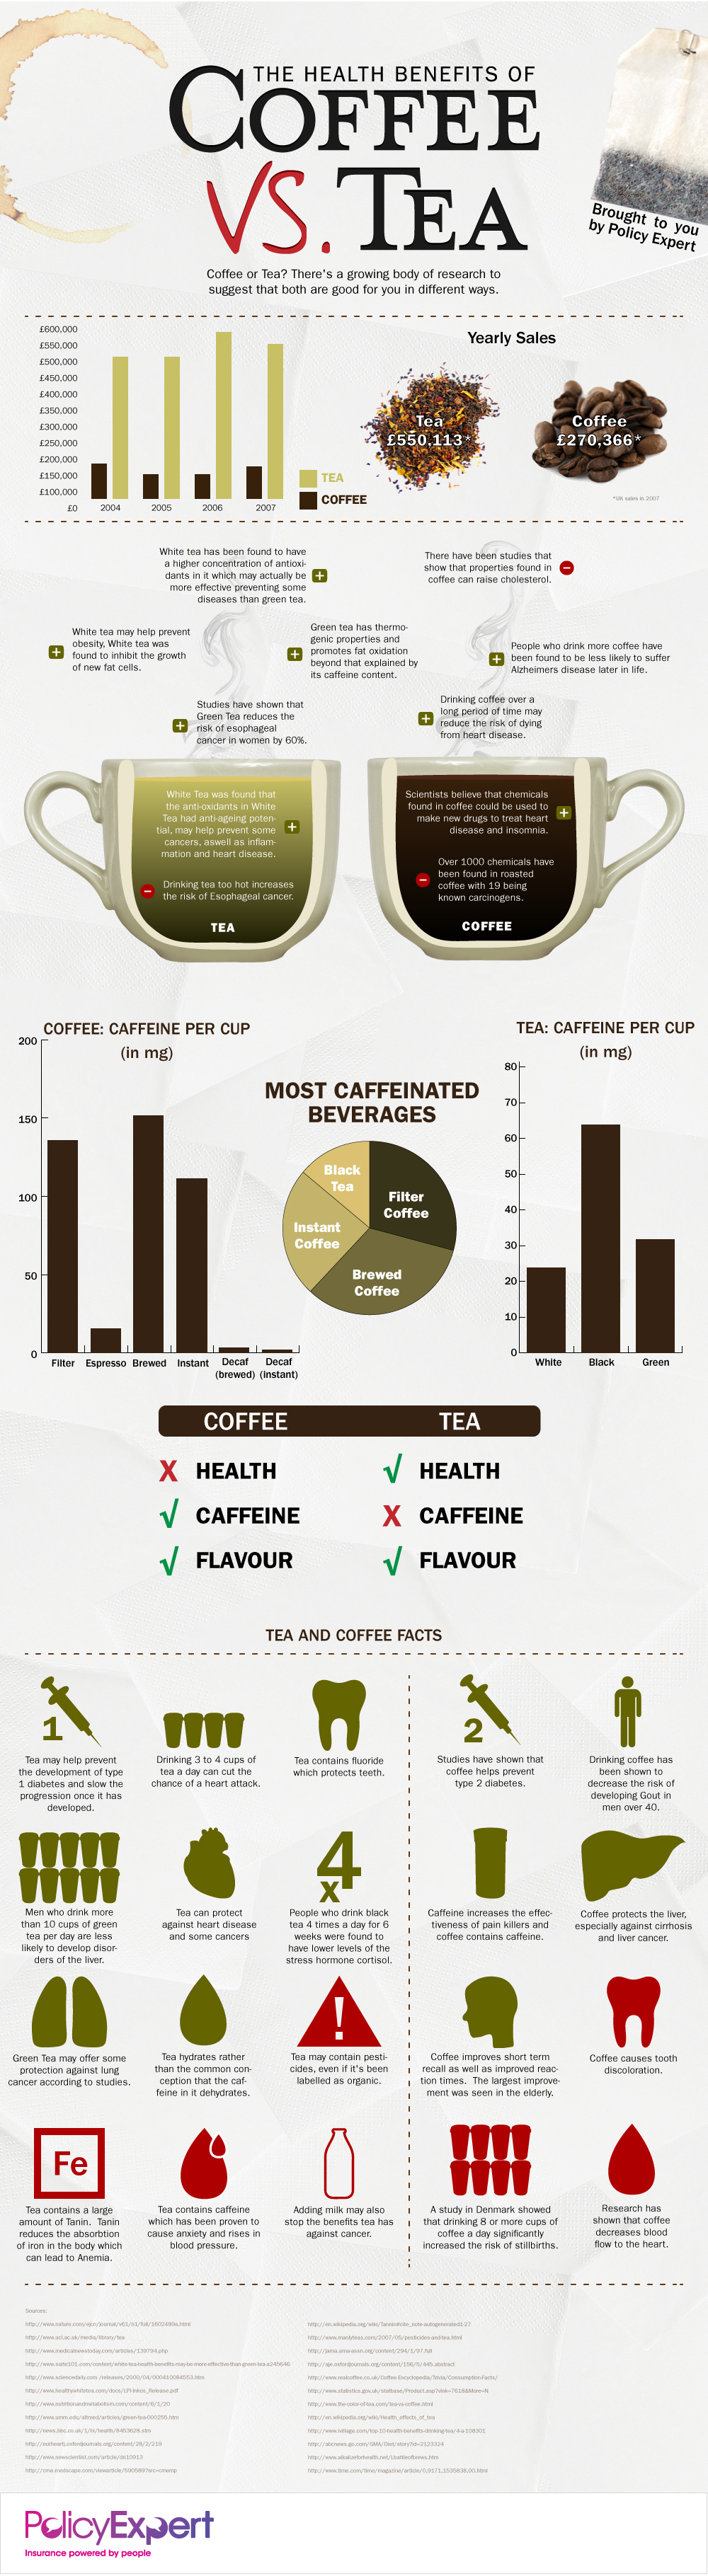 04 the-health-benefits-of-coffee-vs-tea_50290b546445d